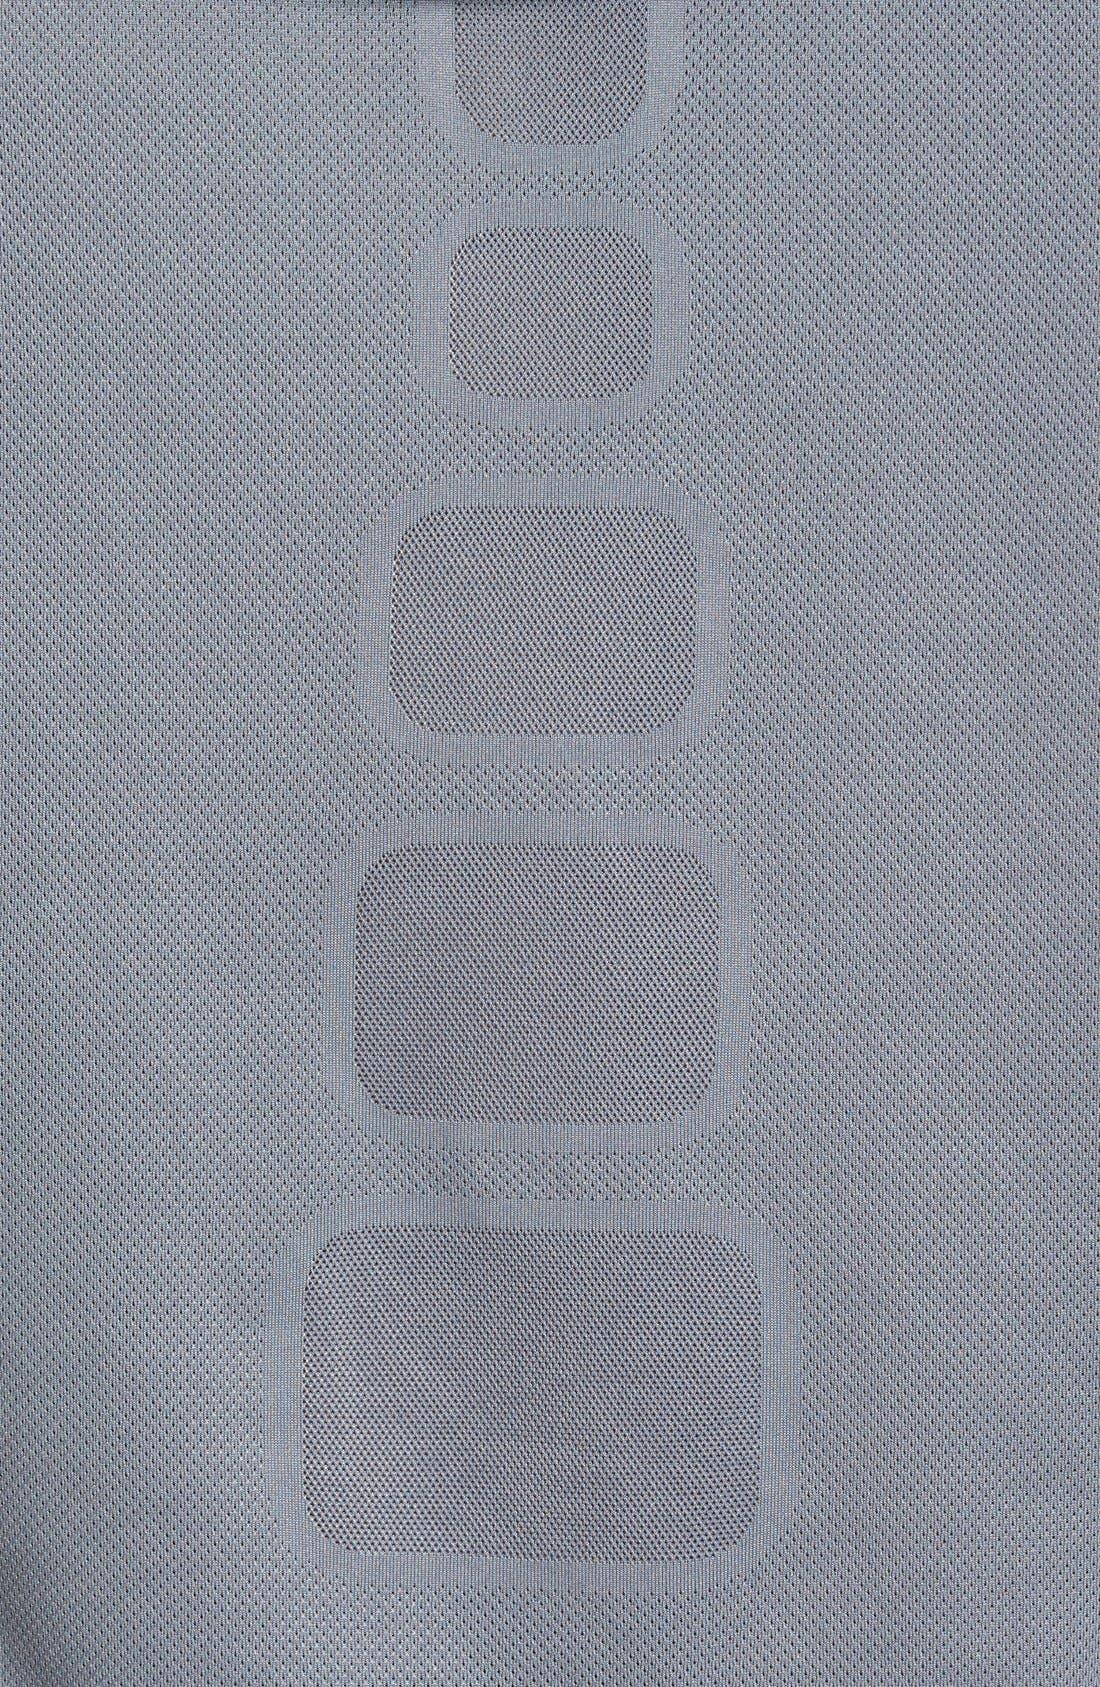 Alternate Image 5  - Nike 'Elite Shooter - Dri-FIT' Long Sleeve Hooded Basketball Shirt